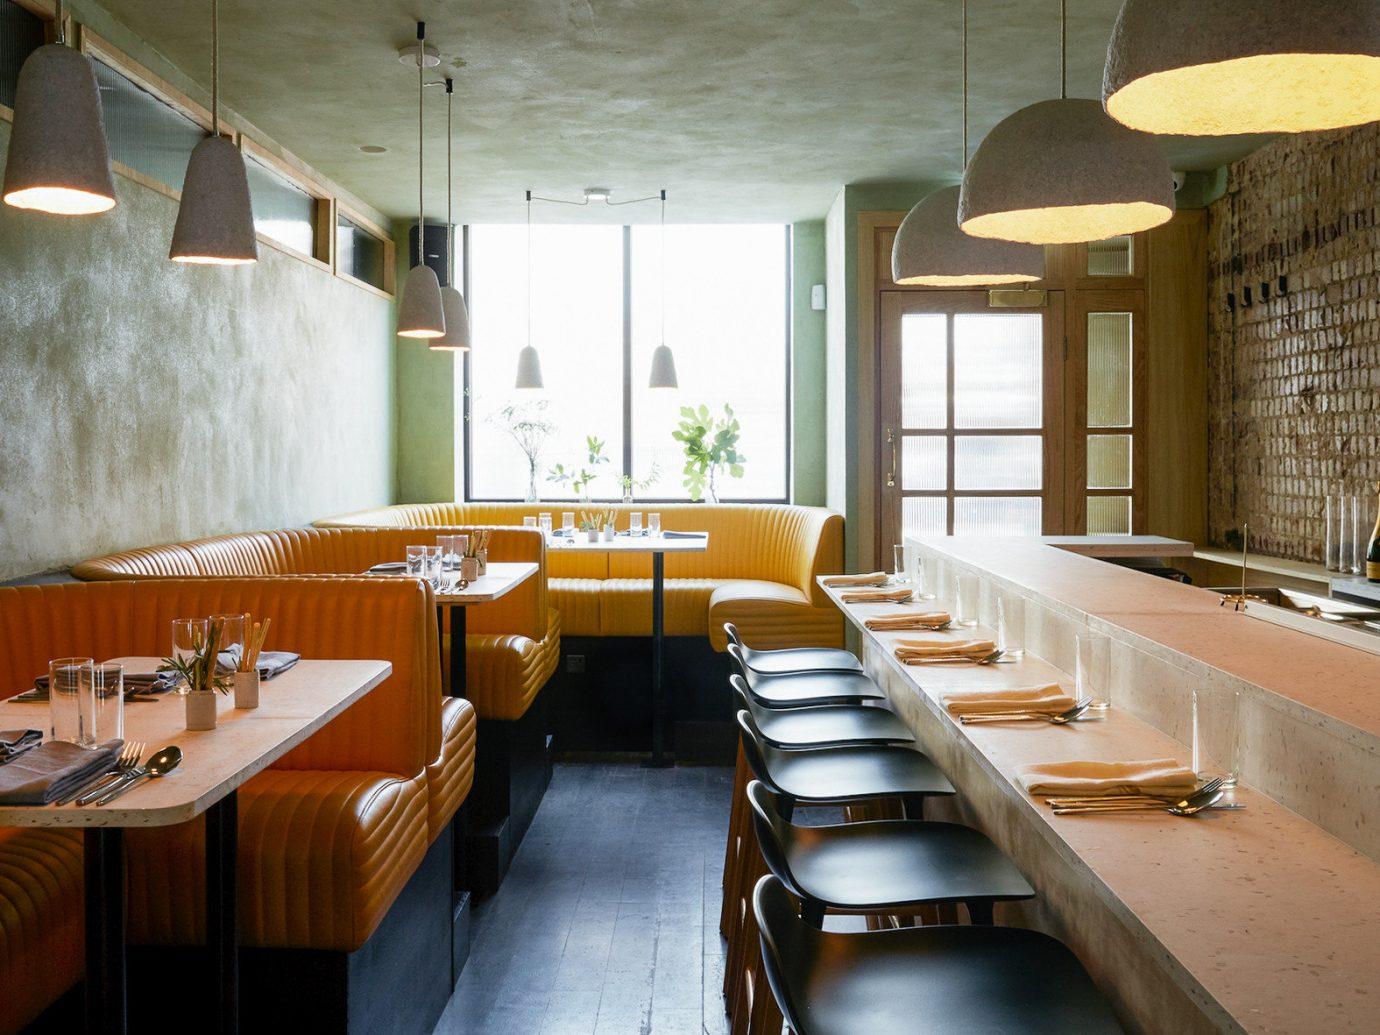 Food + Drink London table indoor floor restaurant interior design Architecture wooden Dining café furniture wood area several